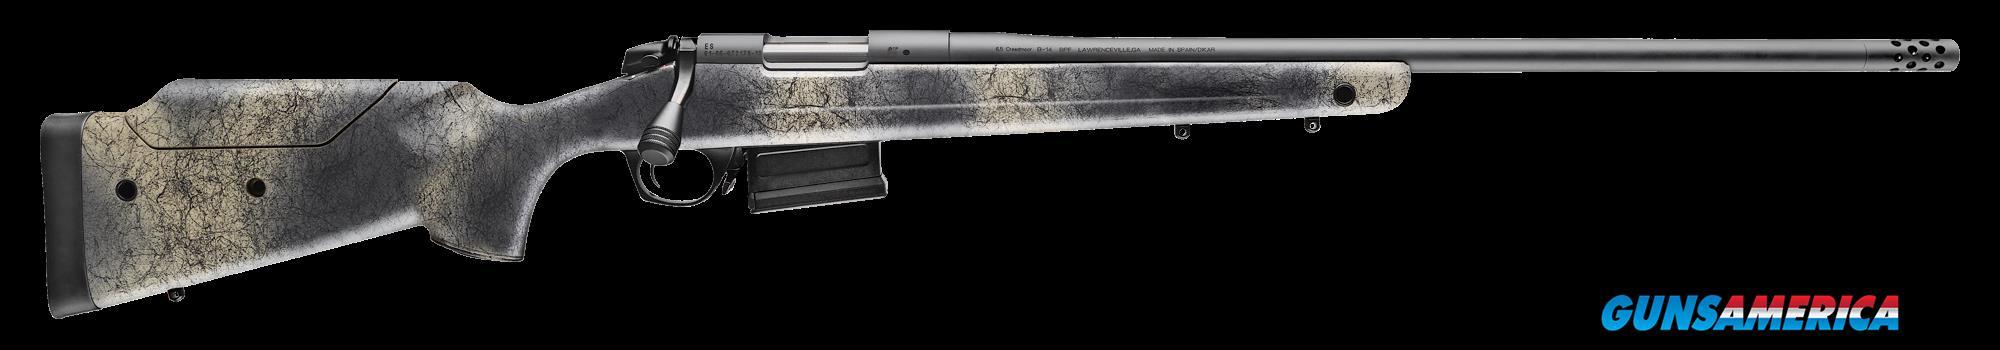 Bergara Rifles B-14, Bergara B14lm651      300mg  Terrain Wldrnss Tb  Guns > Pistols > 1911 Pistol Copies (non-Colt)